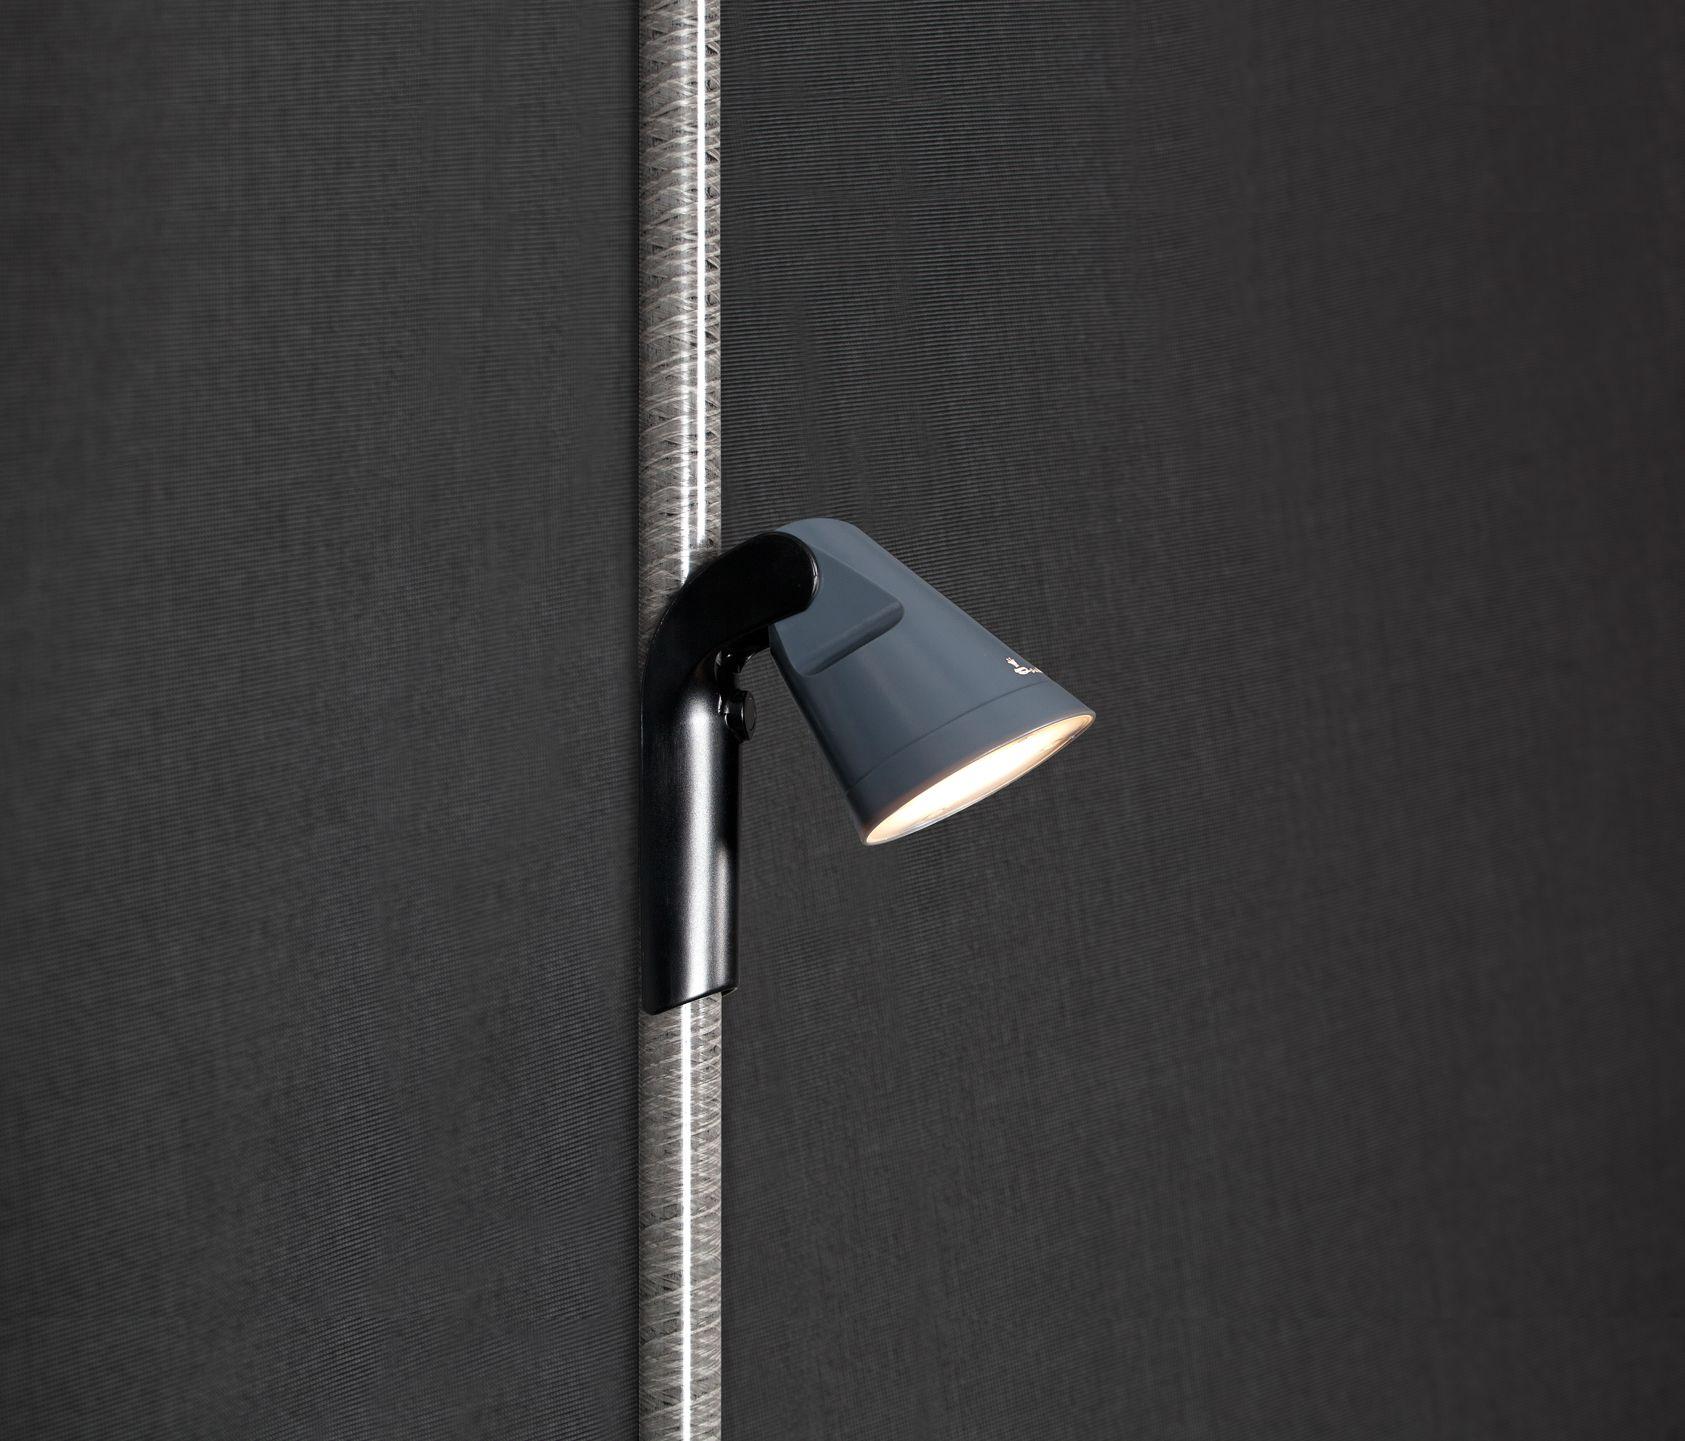 Lampenkap Illumi - Kamperen - Verlichting en Led lampen   Pinterest ...